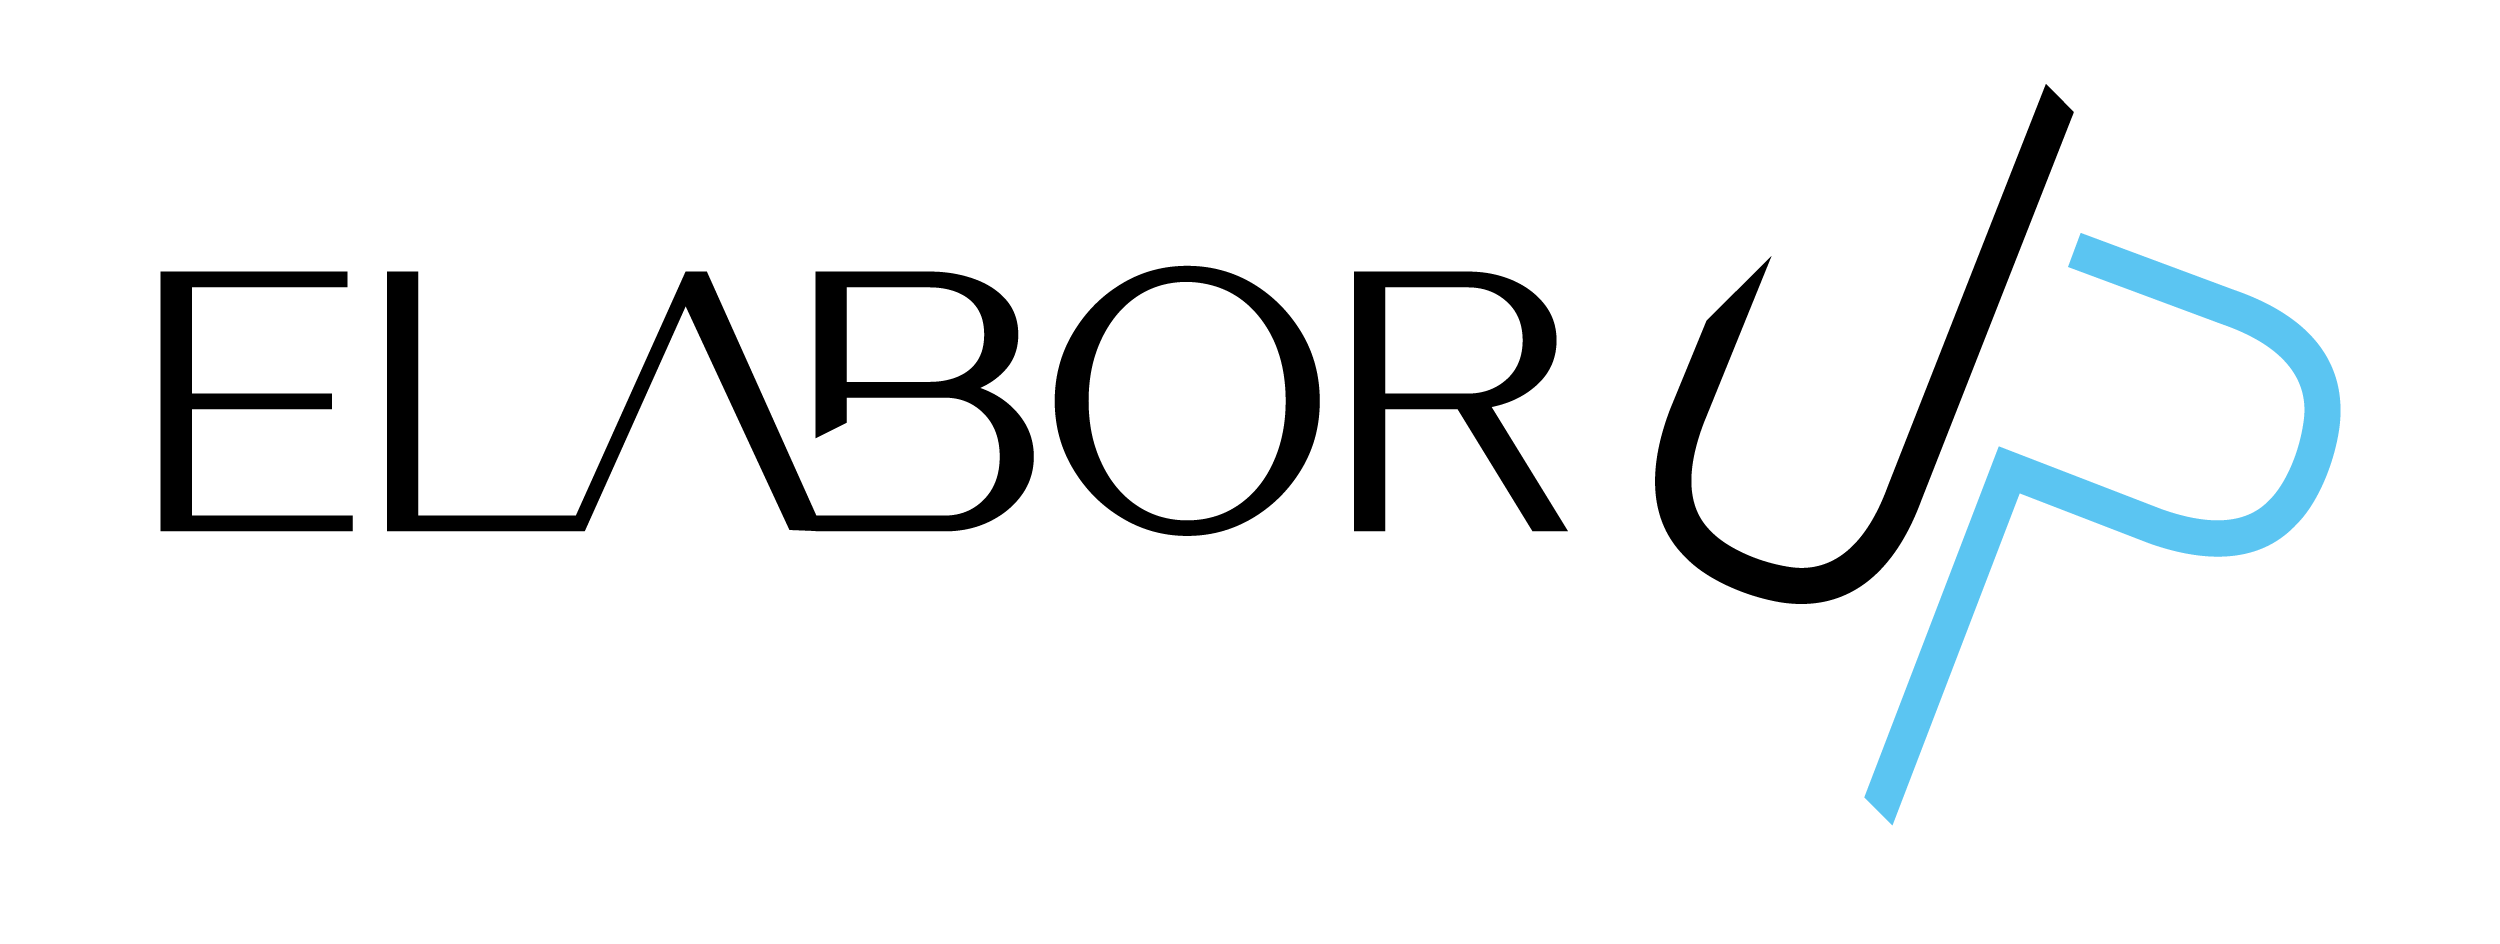 ElaborUP global solutions